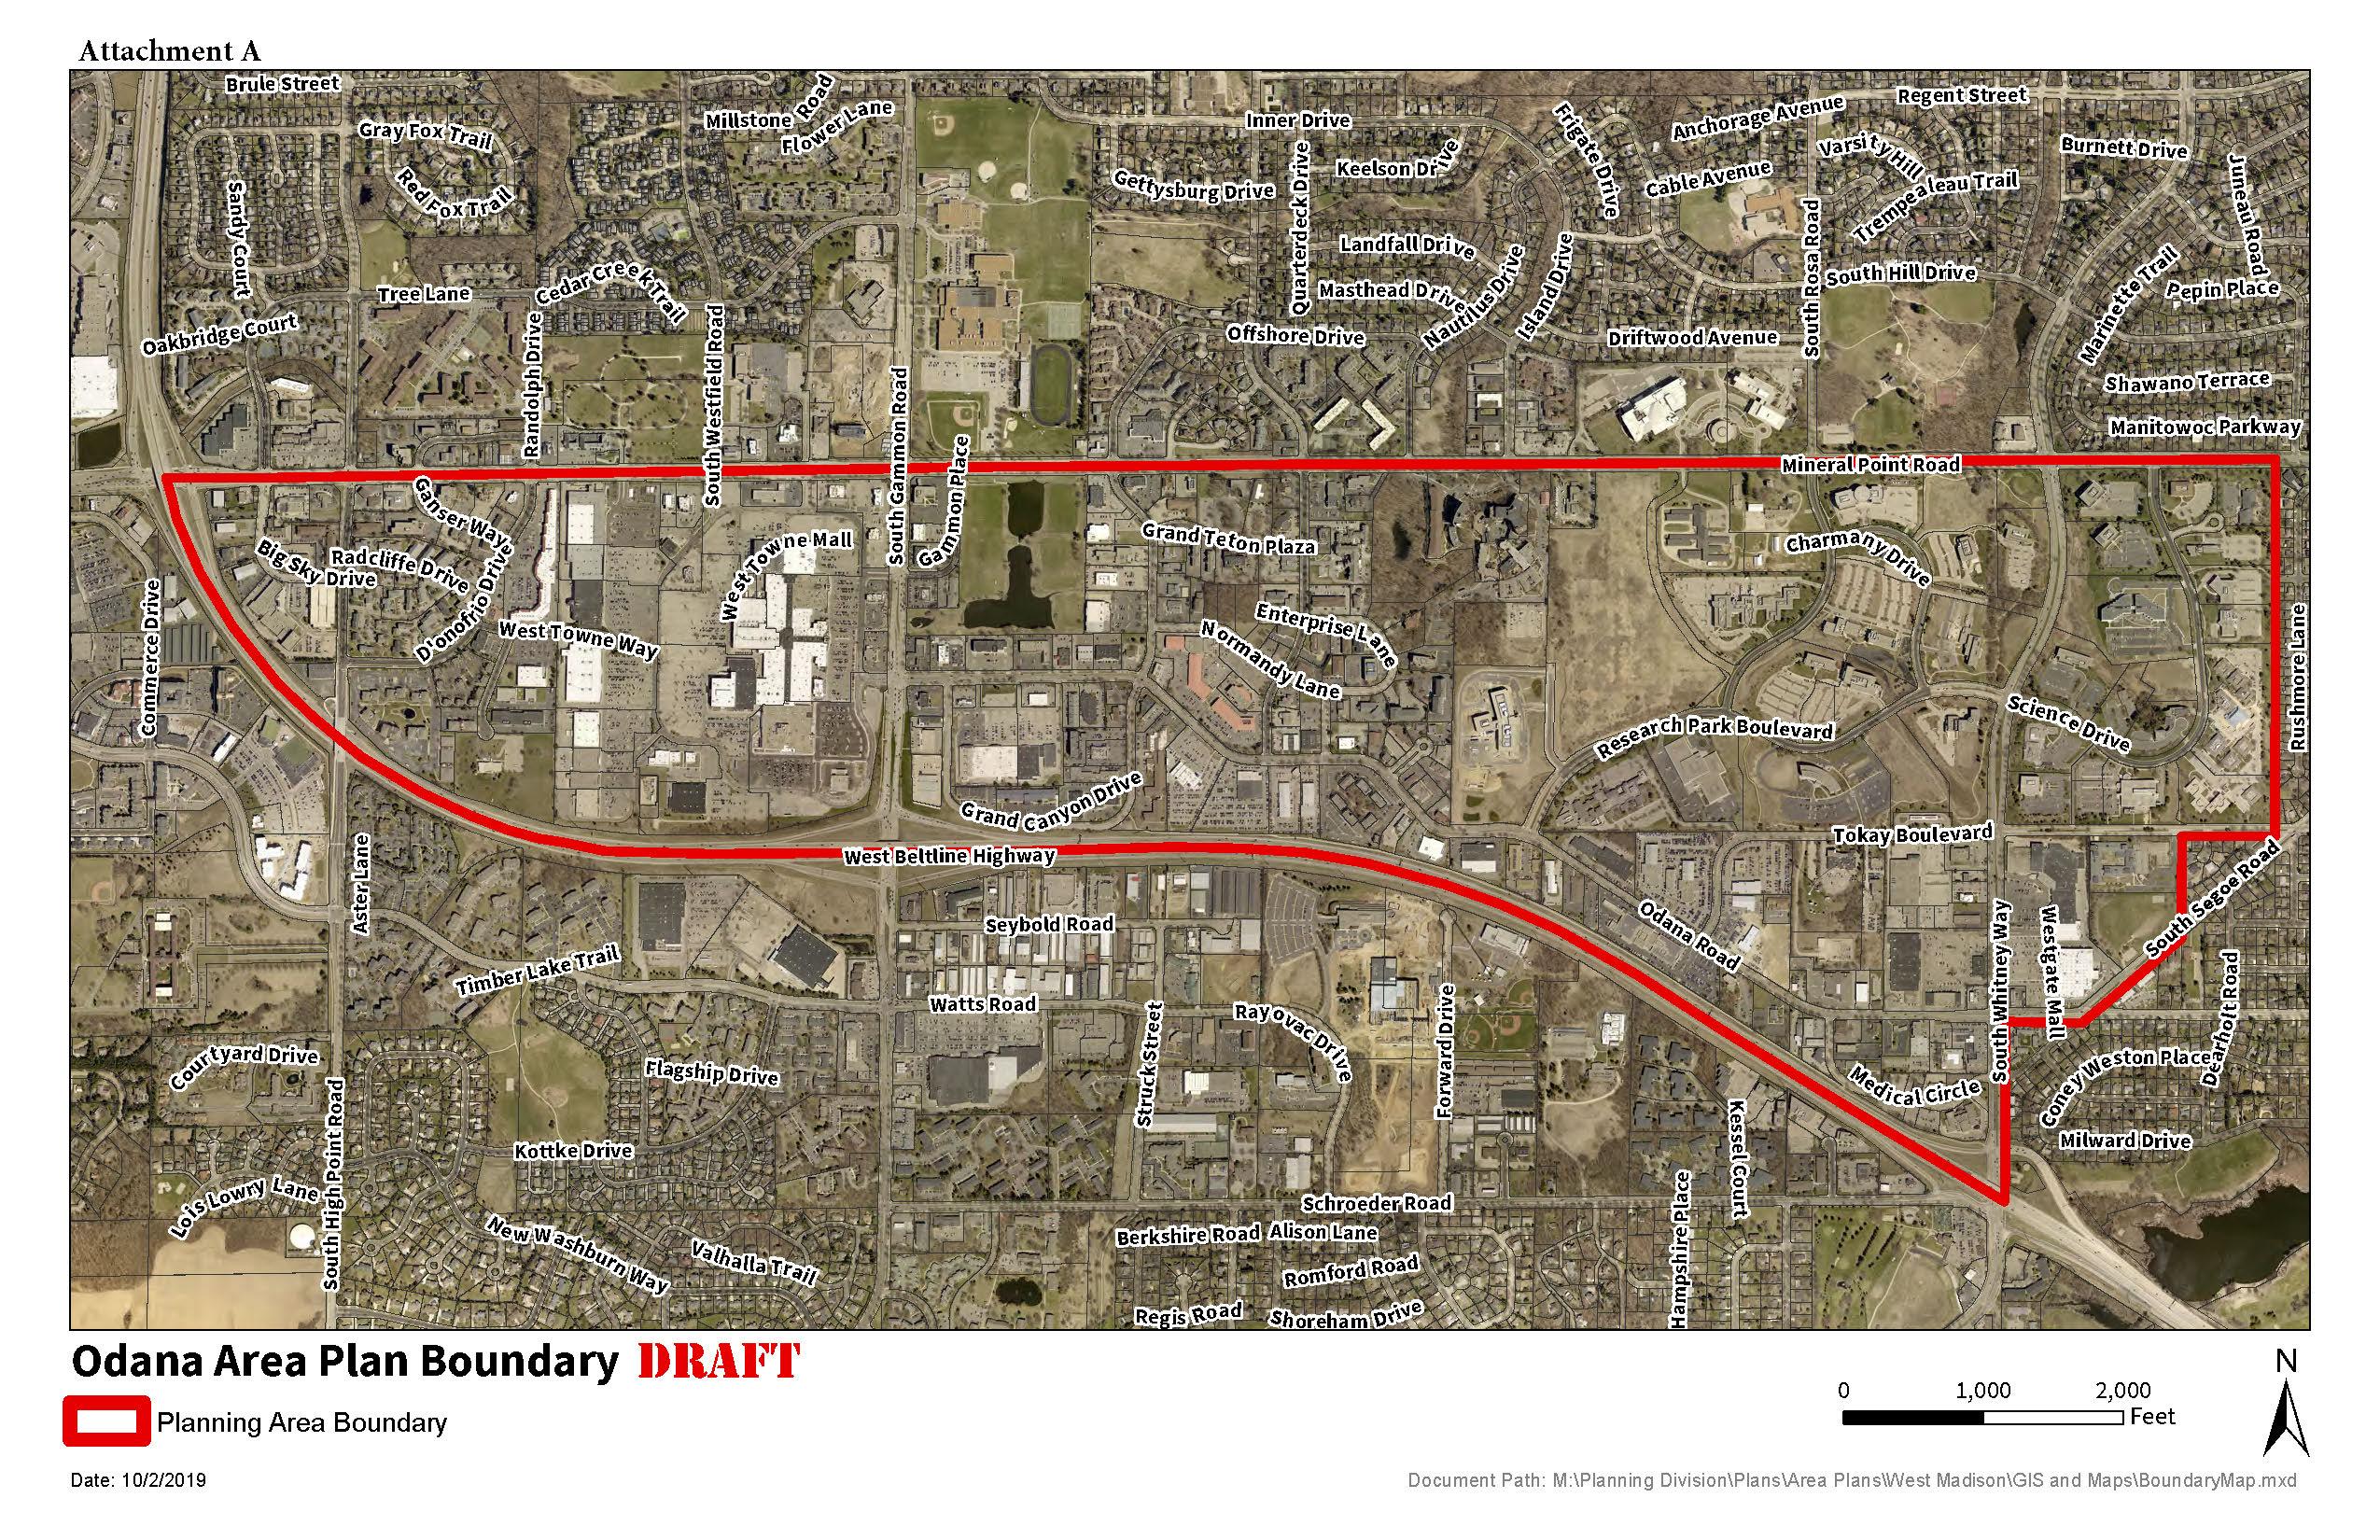 Odana Area Plan Boundary